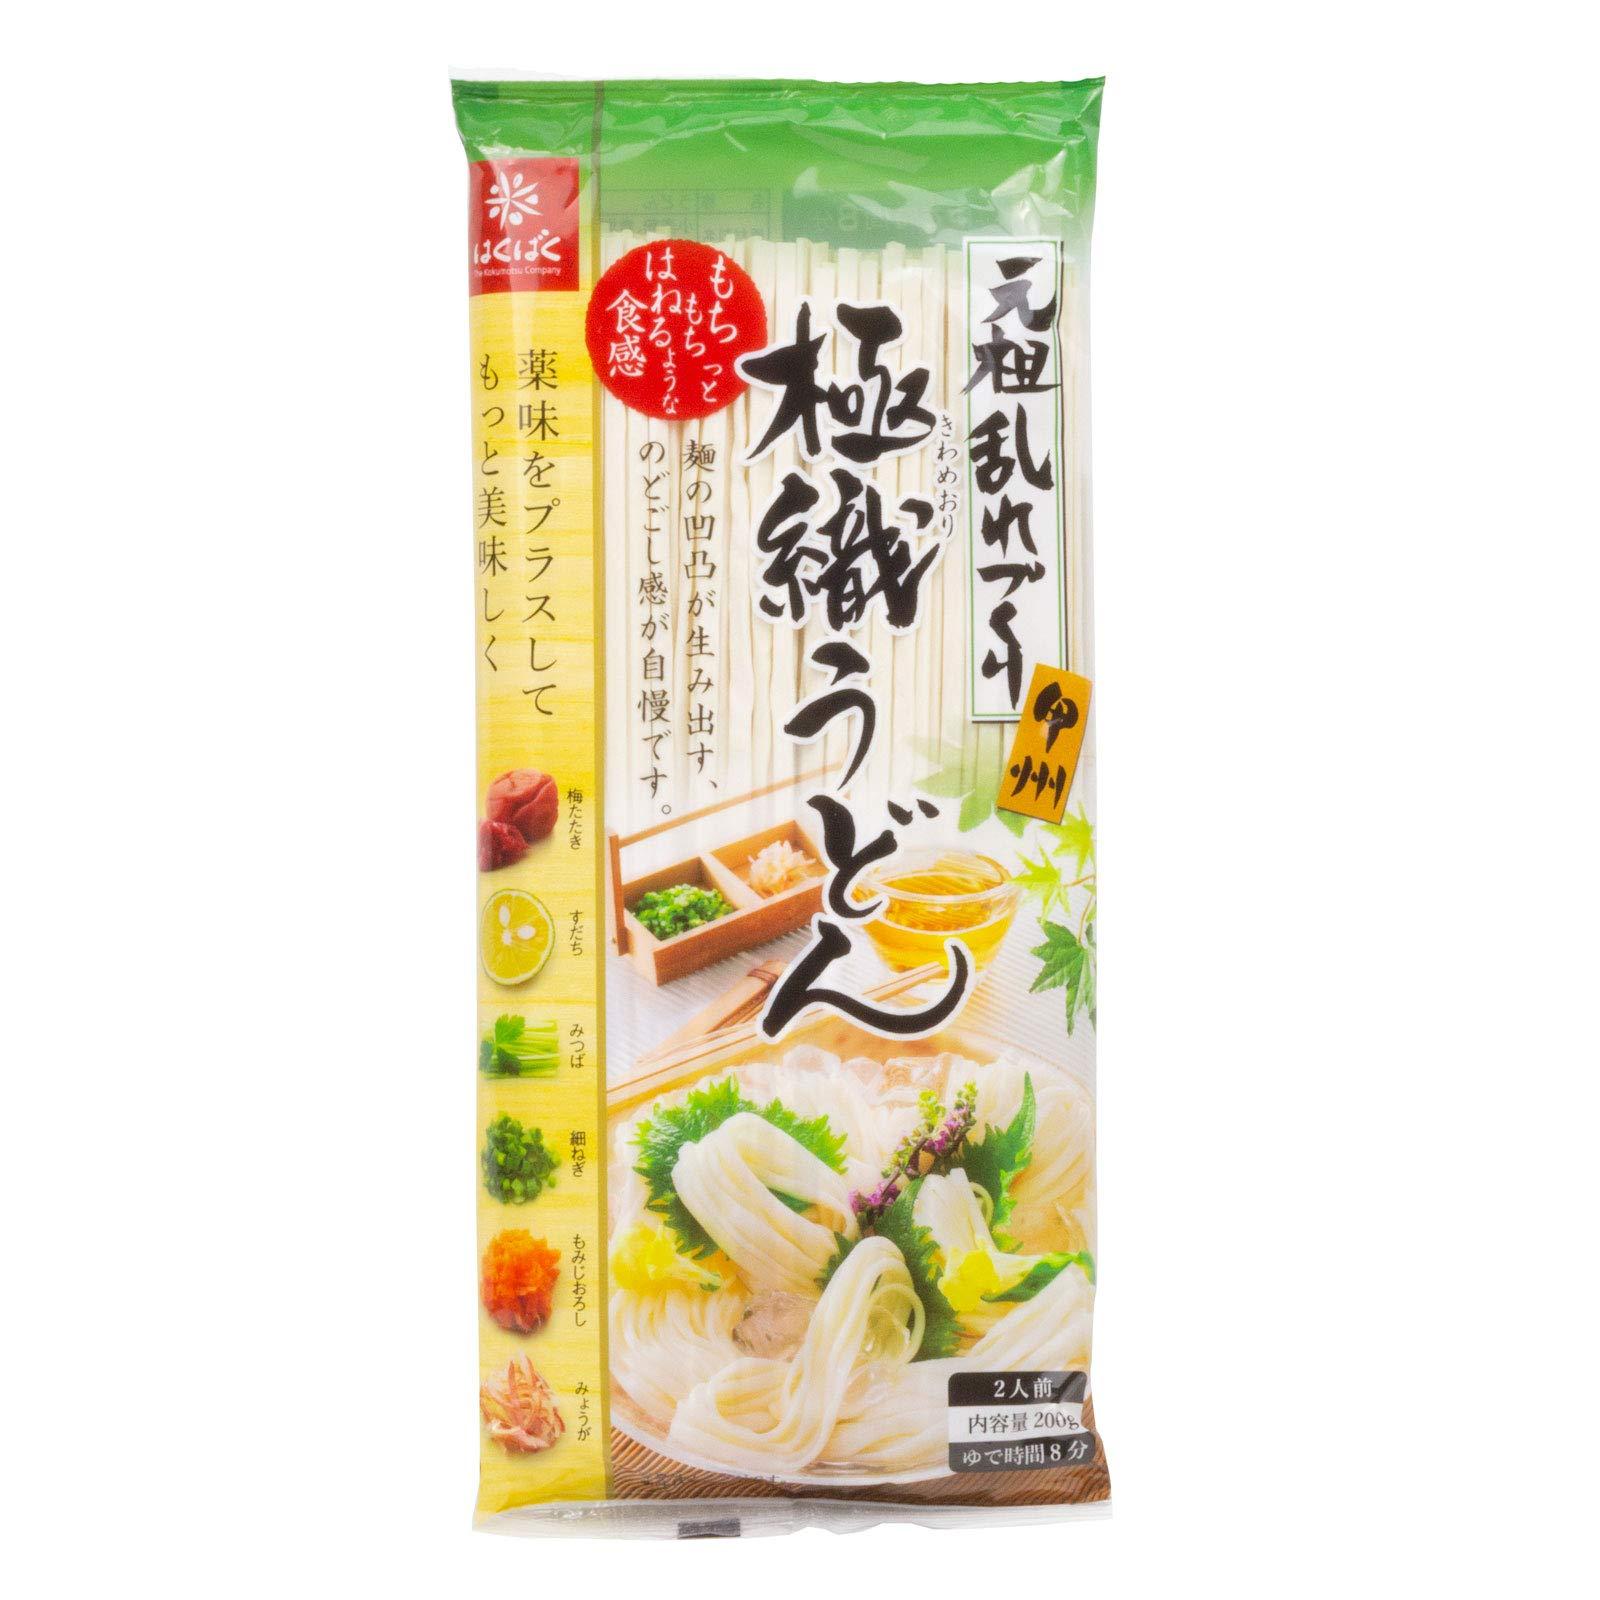 Habakuku Authentic Japanese Udon Noodle, Kiwameori Udon 7oz (10 pack) by HAKUBAKU THE KOKUMOTSU COMPANY